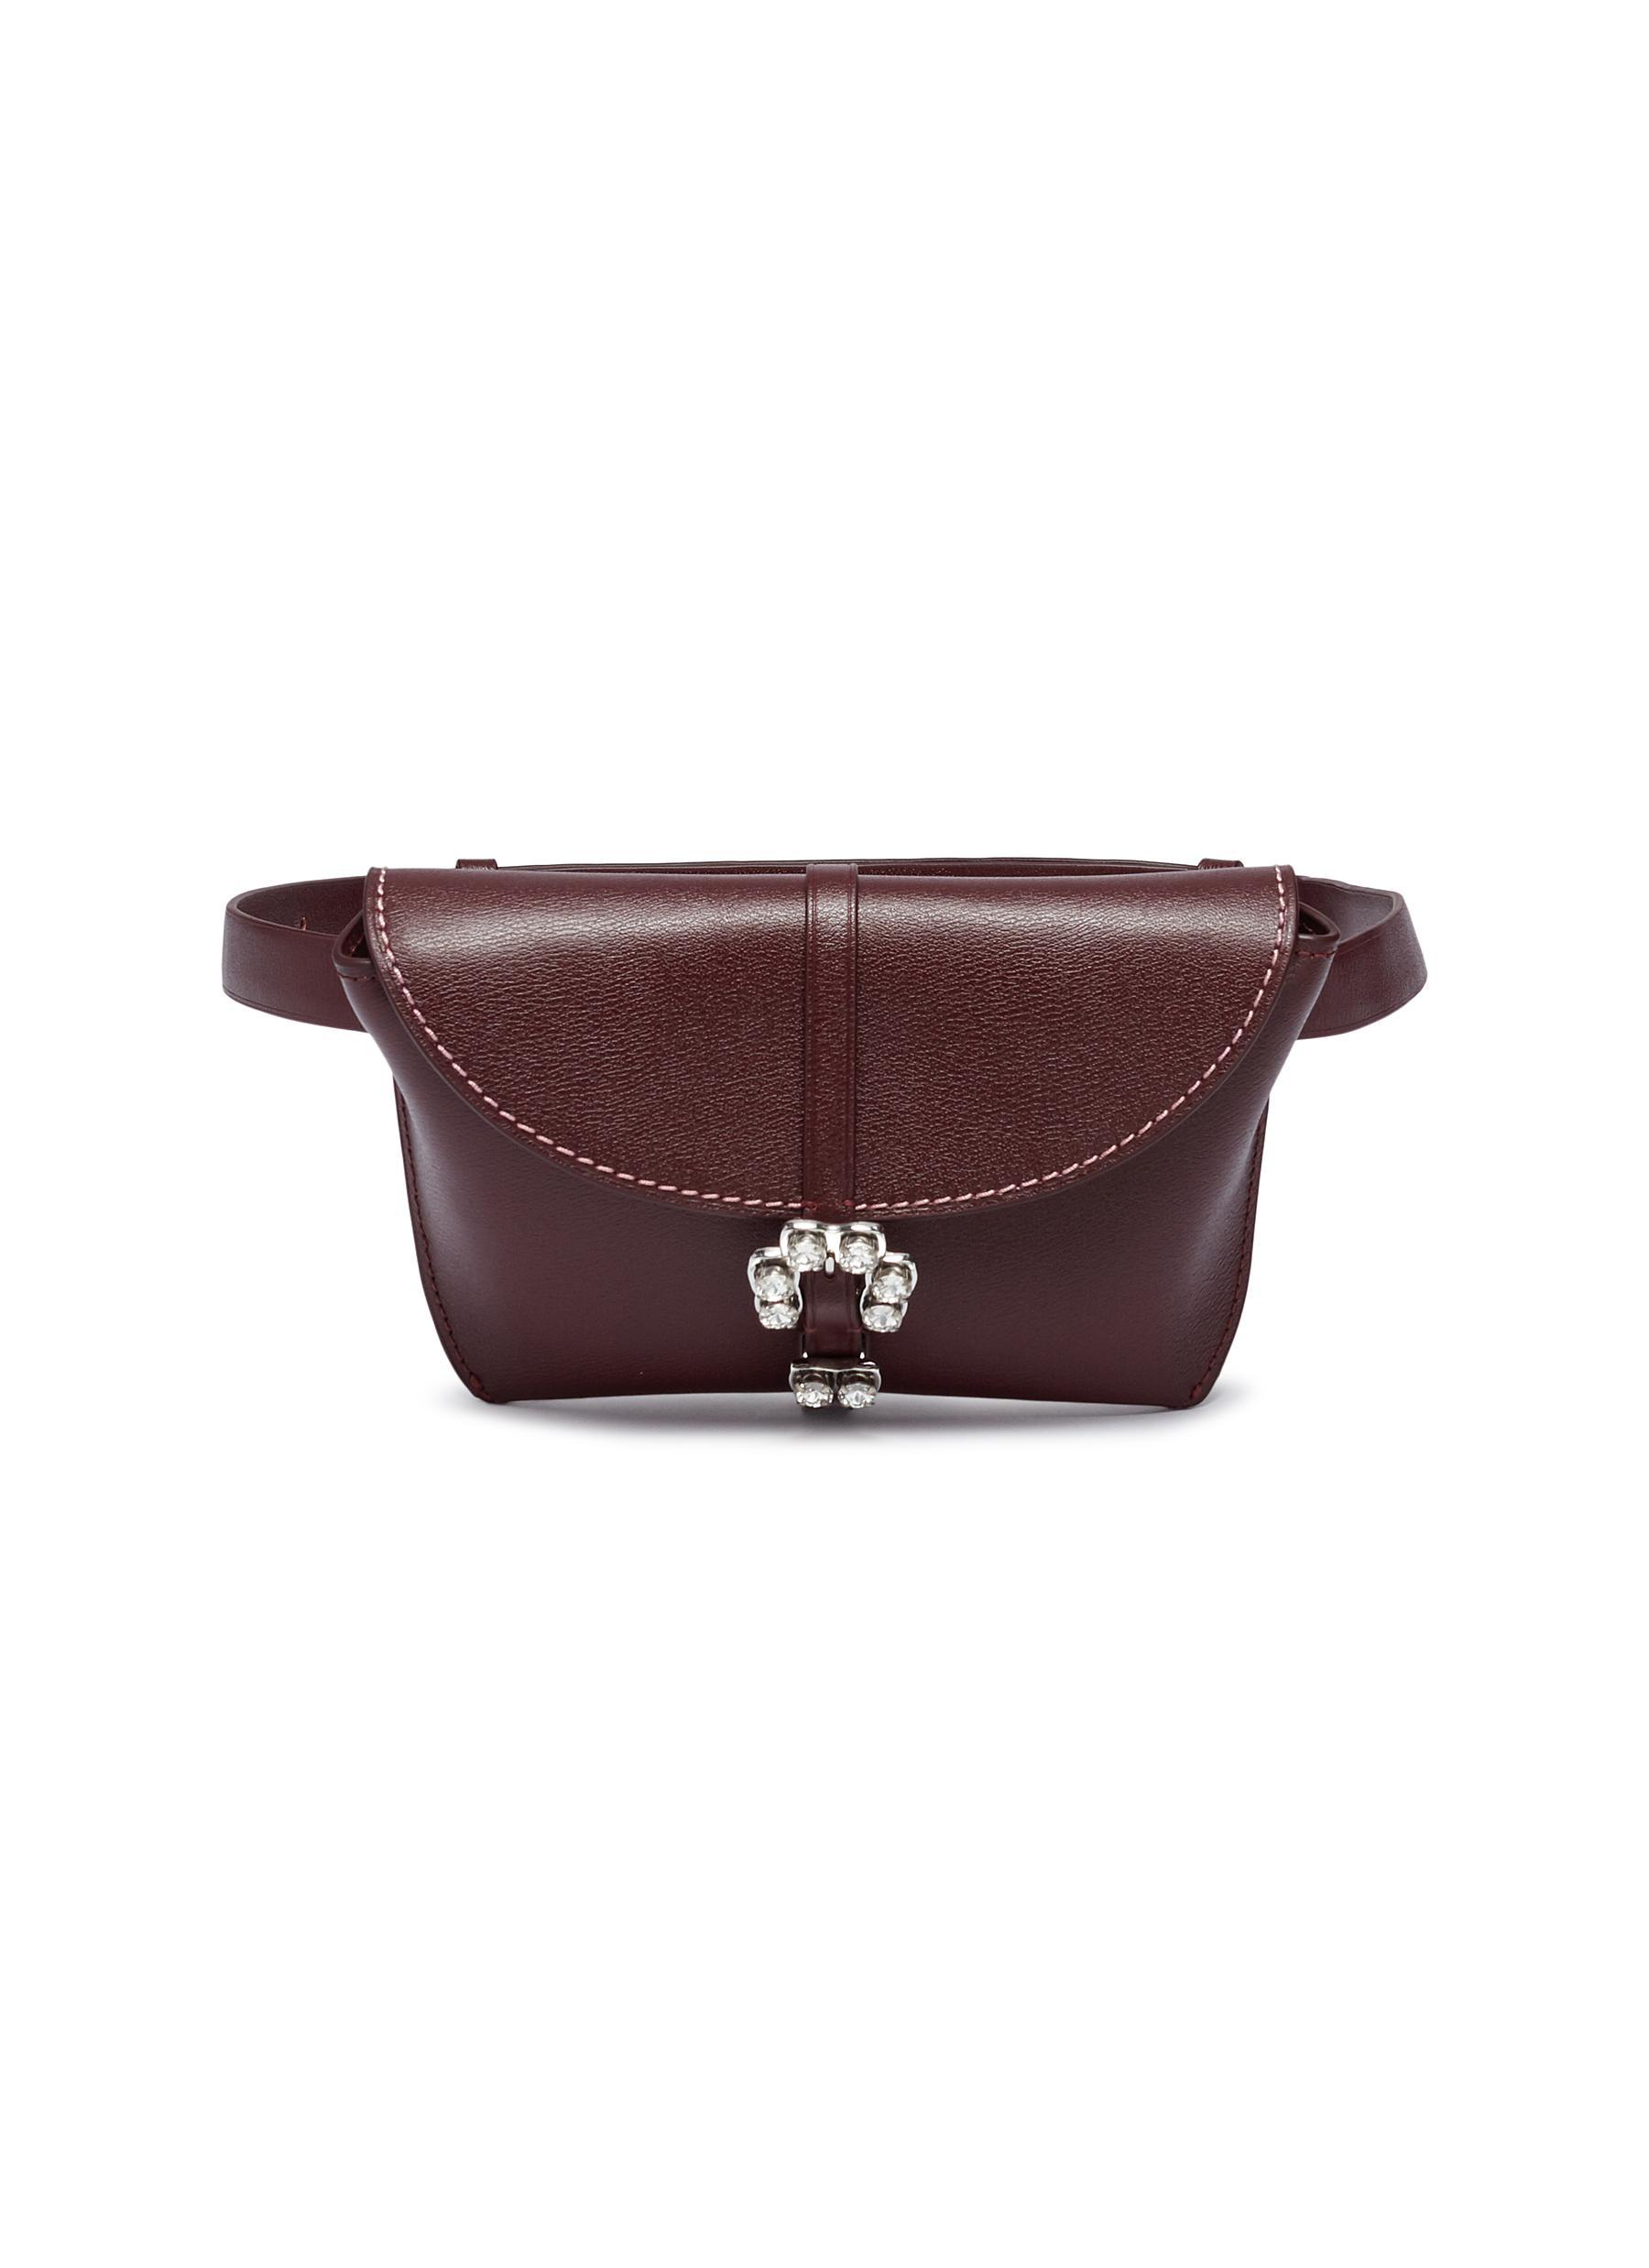 32a396944af7 Lyst - 3.1 Phillip Lim  hudson  Jewelled Buckle Leather Bum Bag